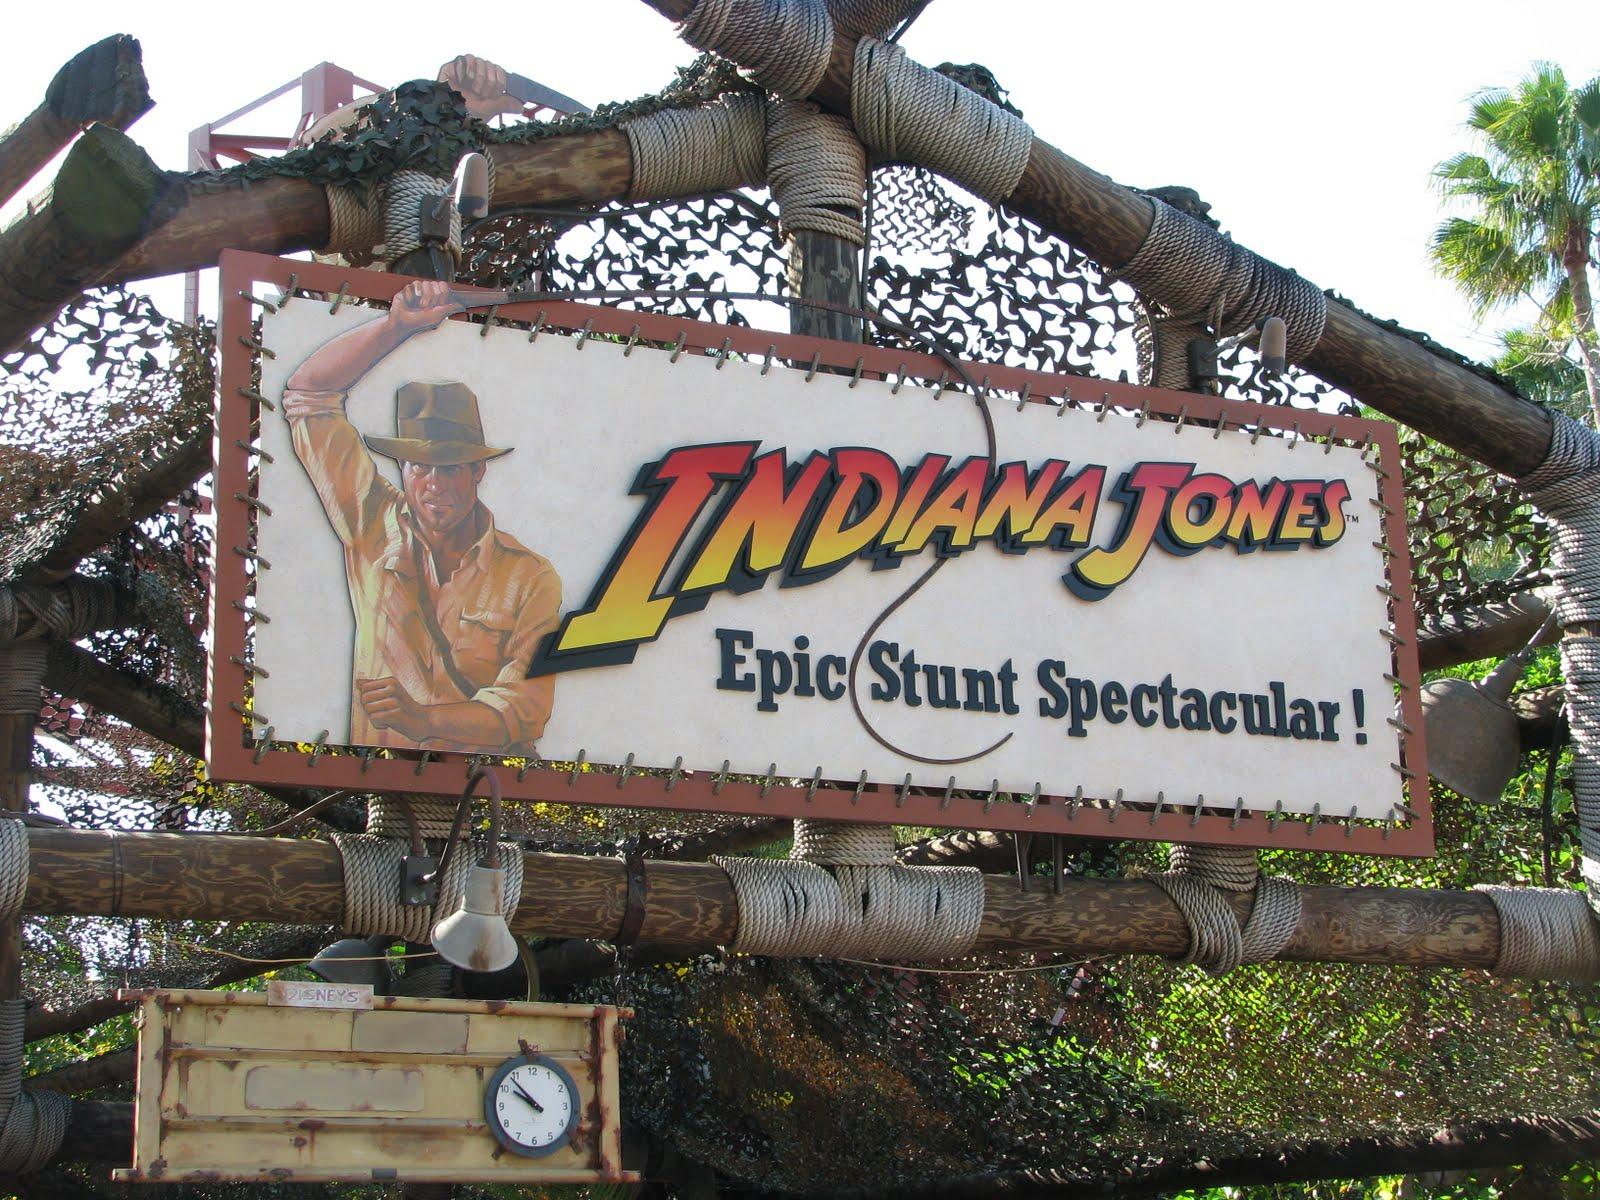 Indiana jones epic stunt spectacular at disney s hollywood studios